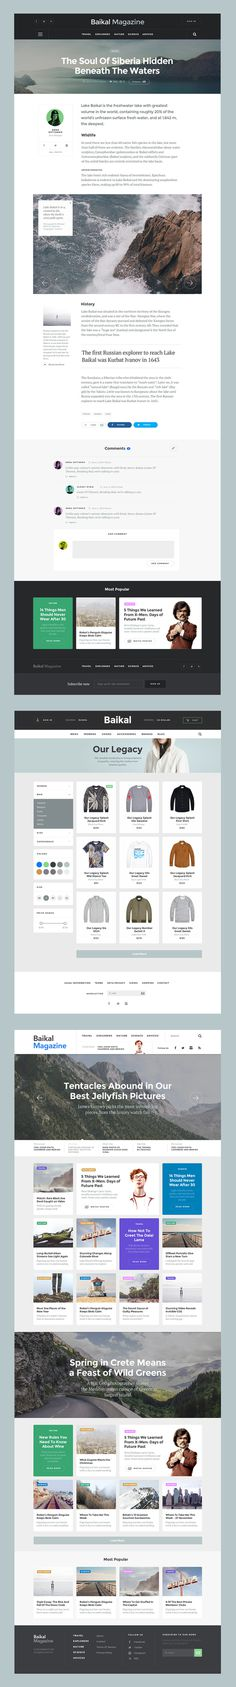 Baikal_preview_samples #design #ui #website #kit #web